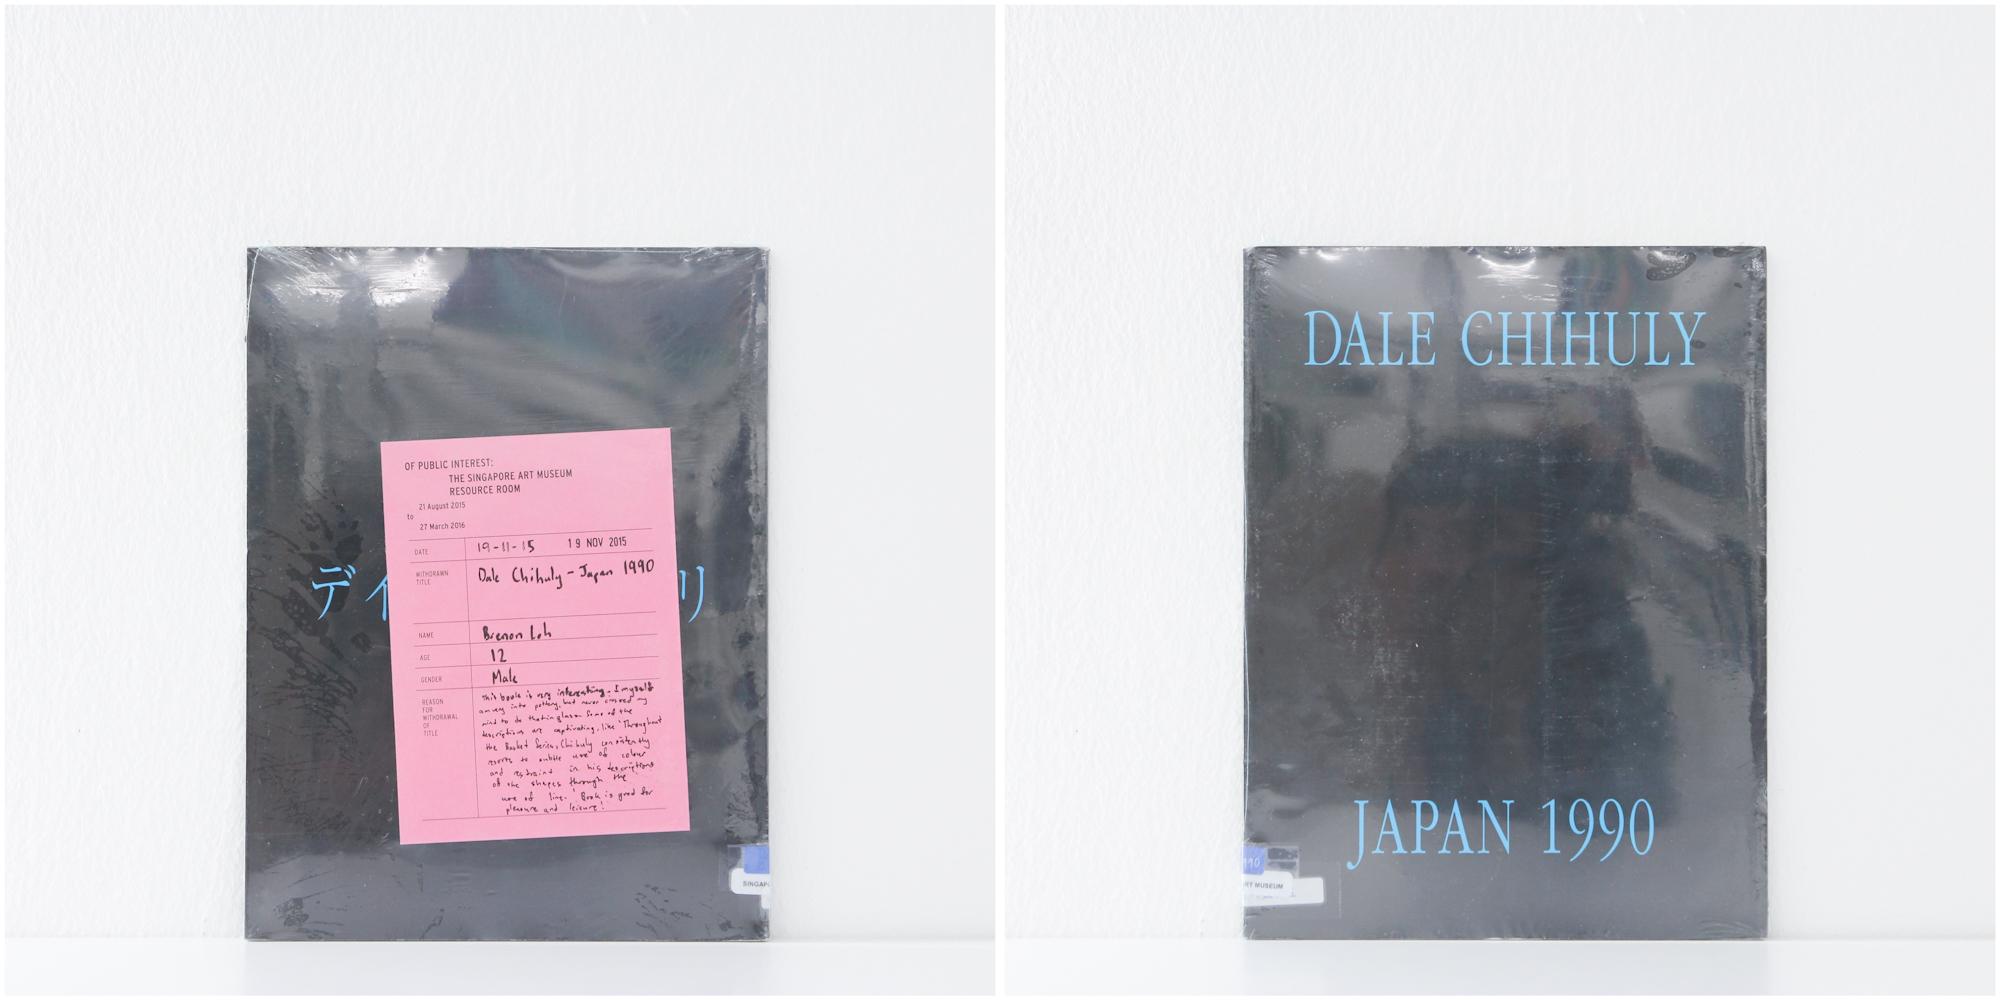 'Dale Chihuly, Japan 1990', 19/11/15, Brenon Loh, 12, Male